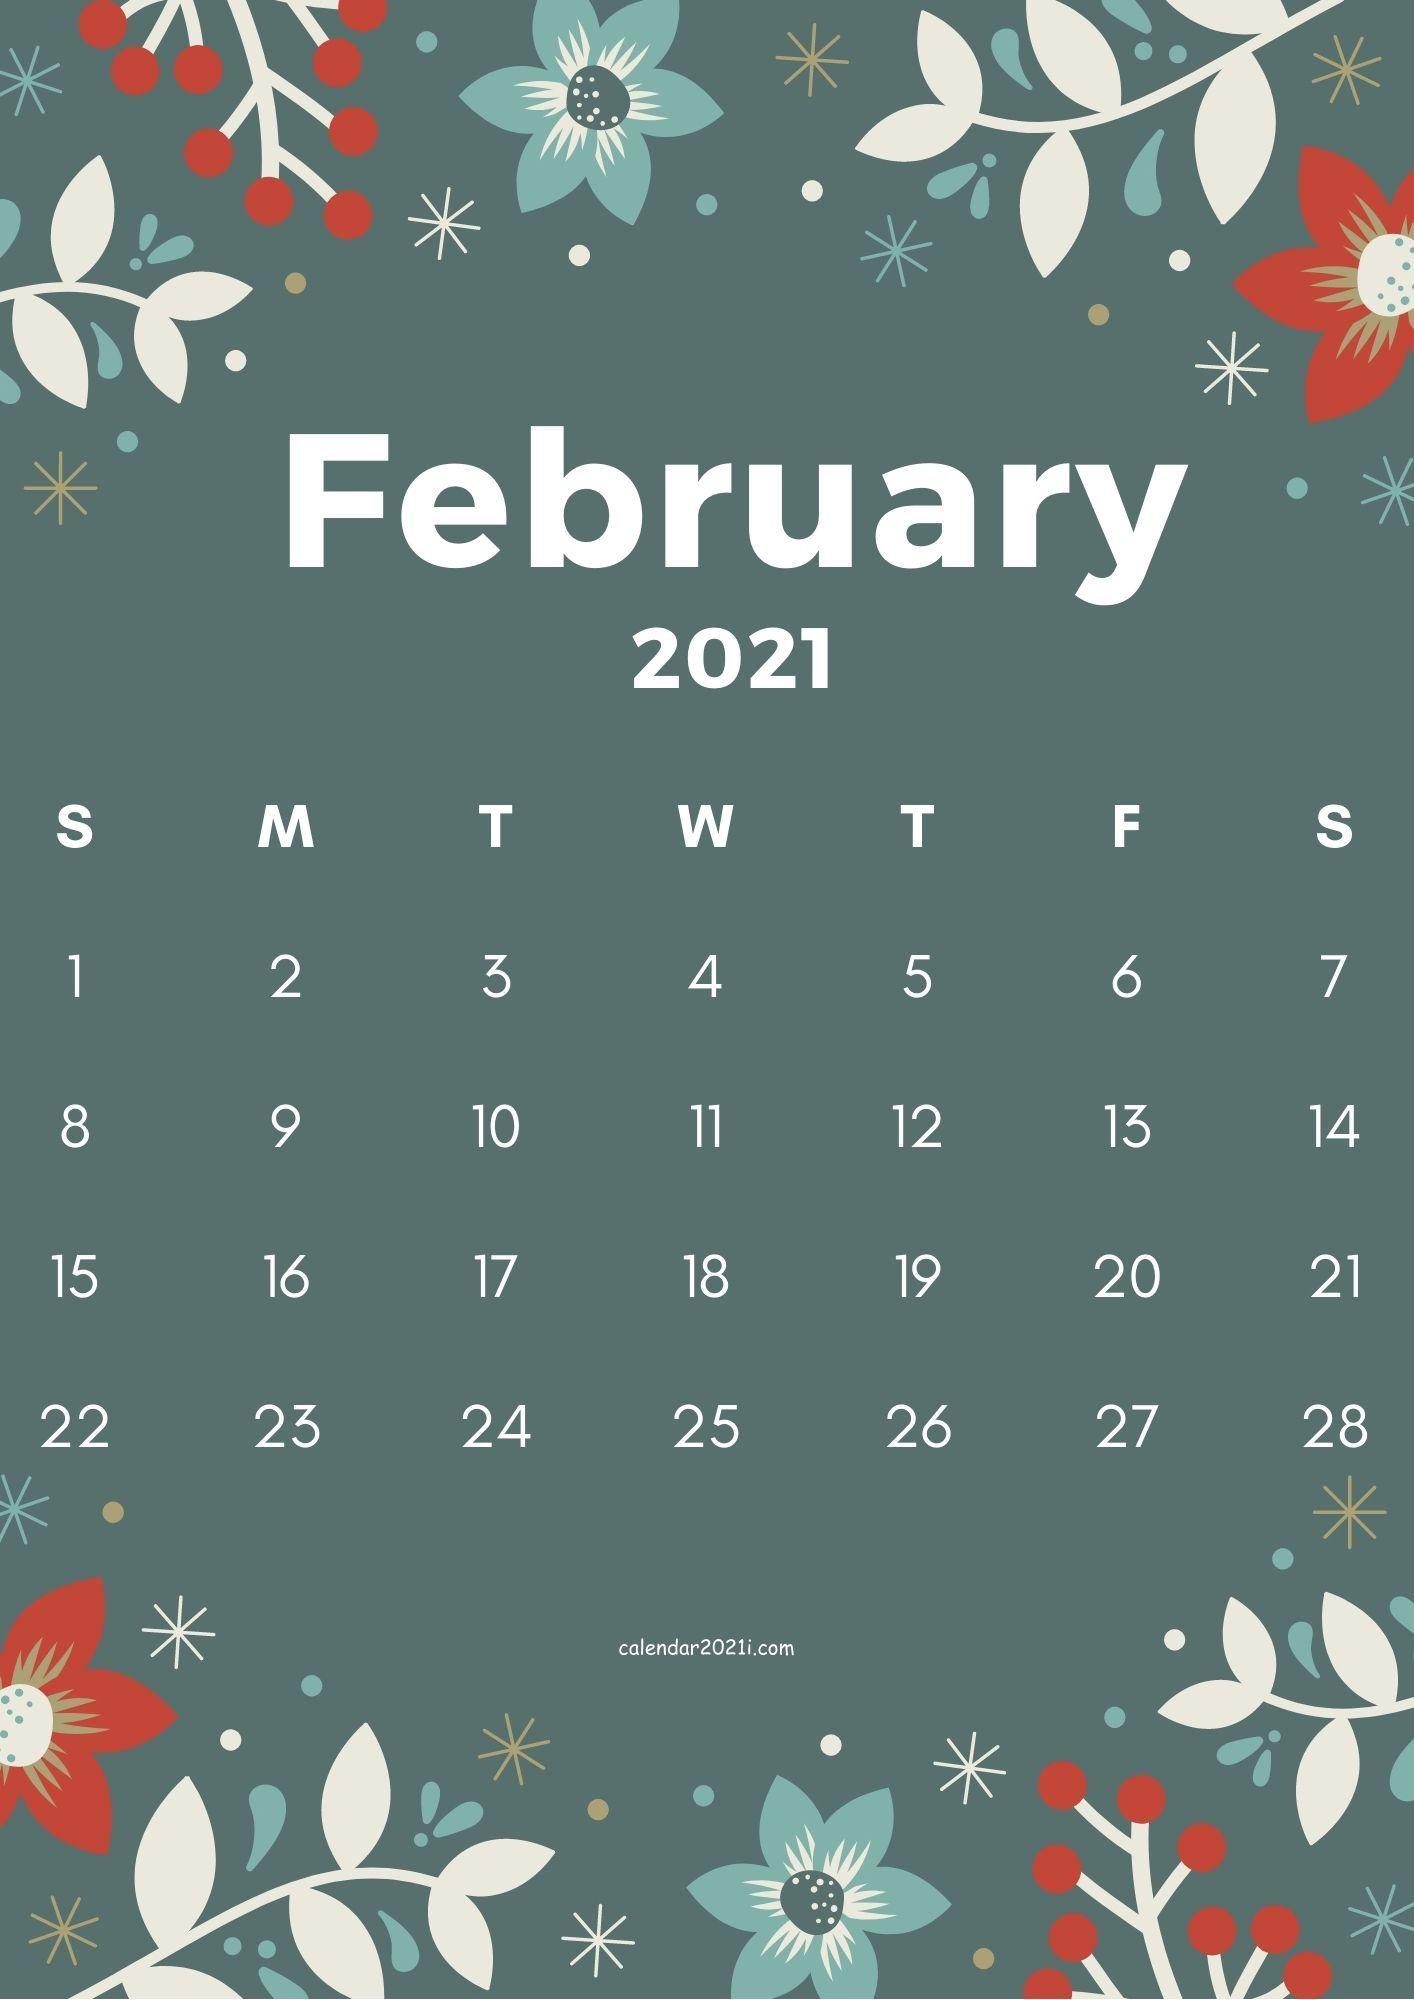 February 2021 Flower Calendar Printable